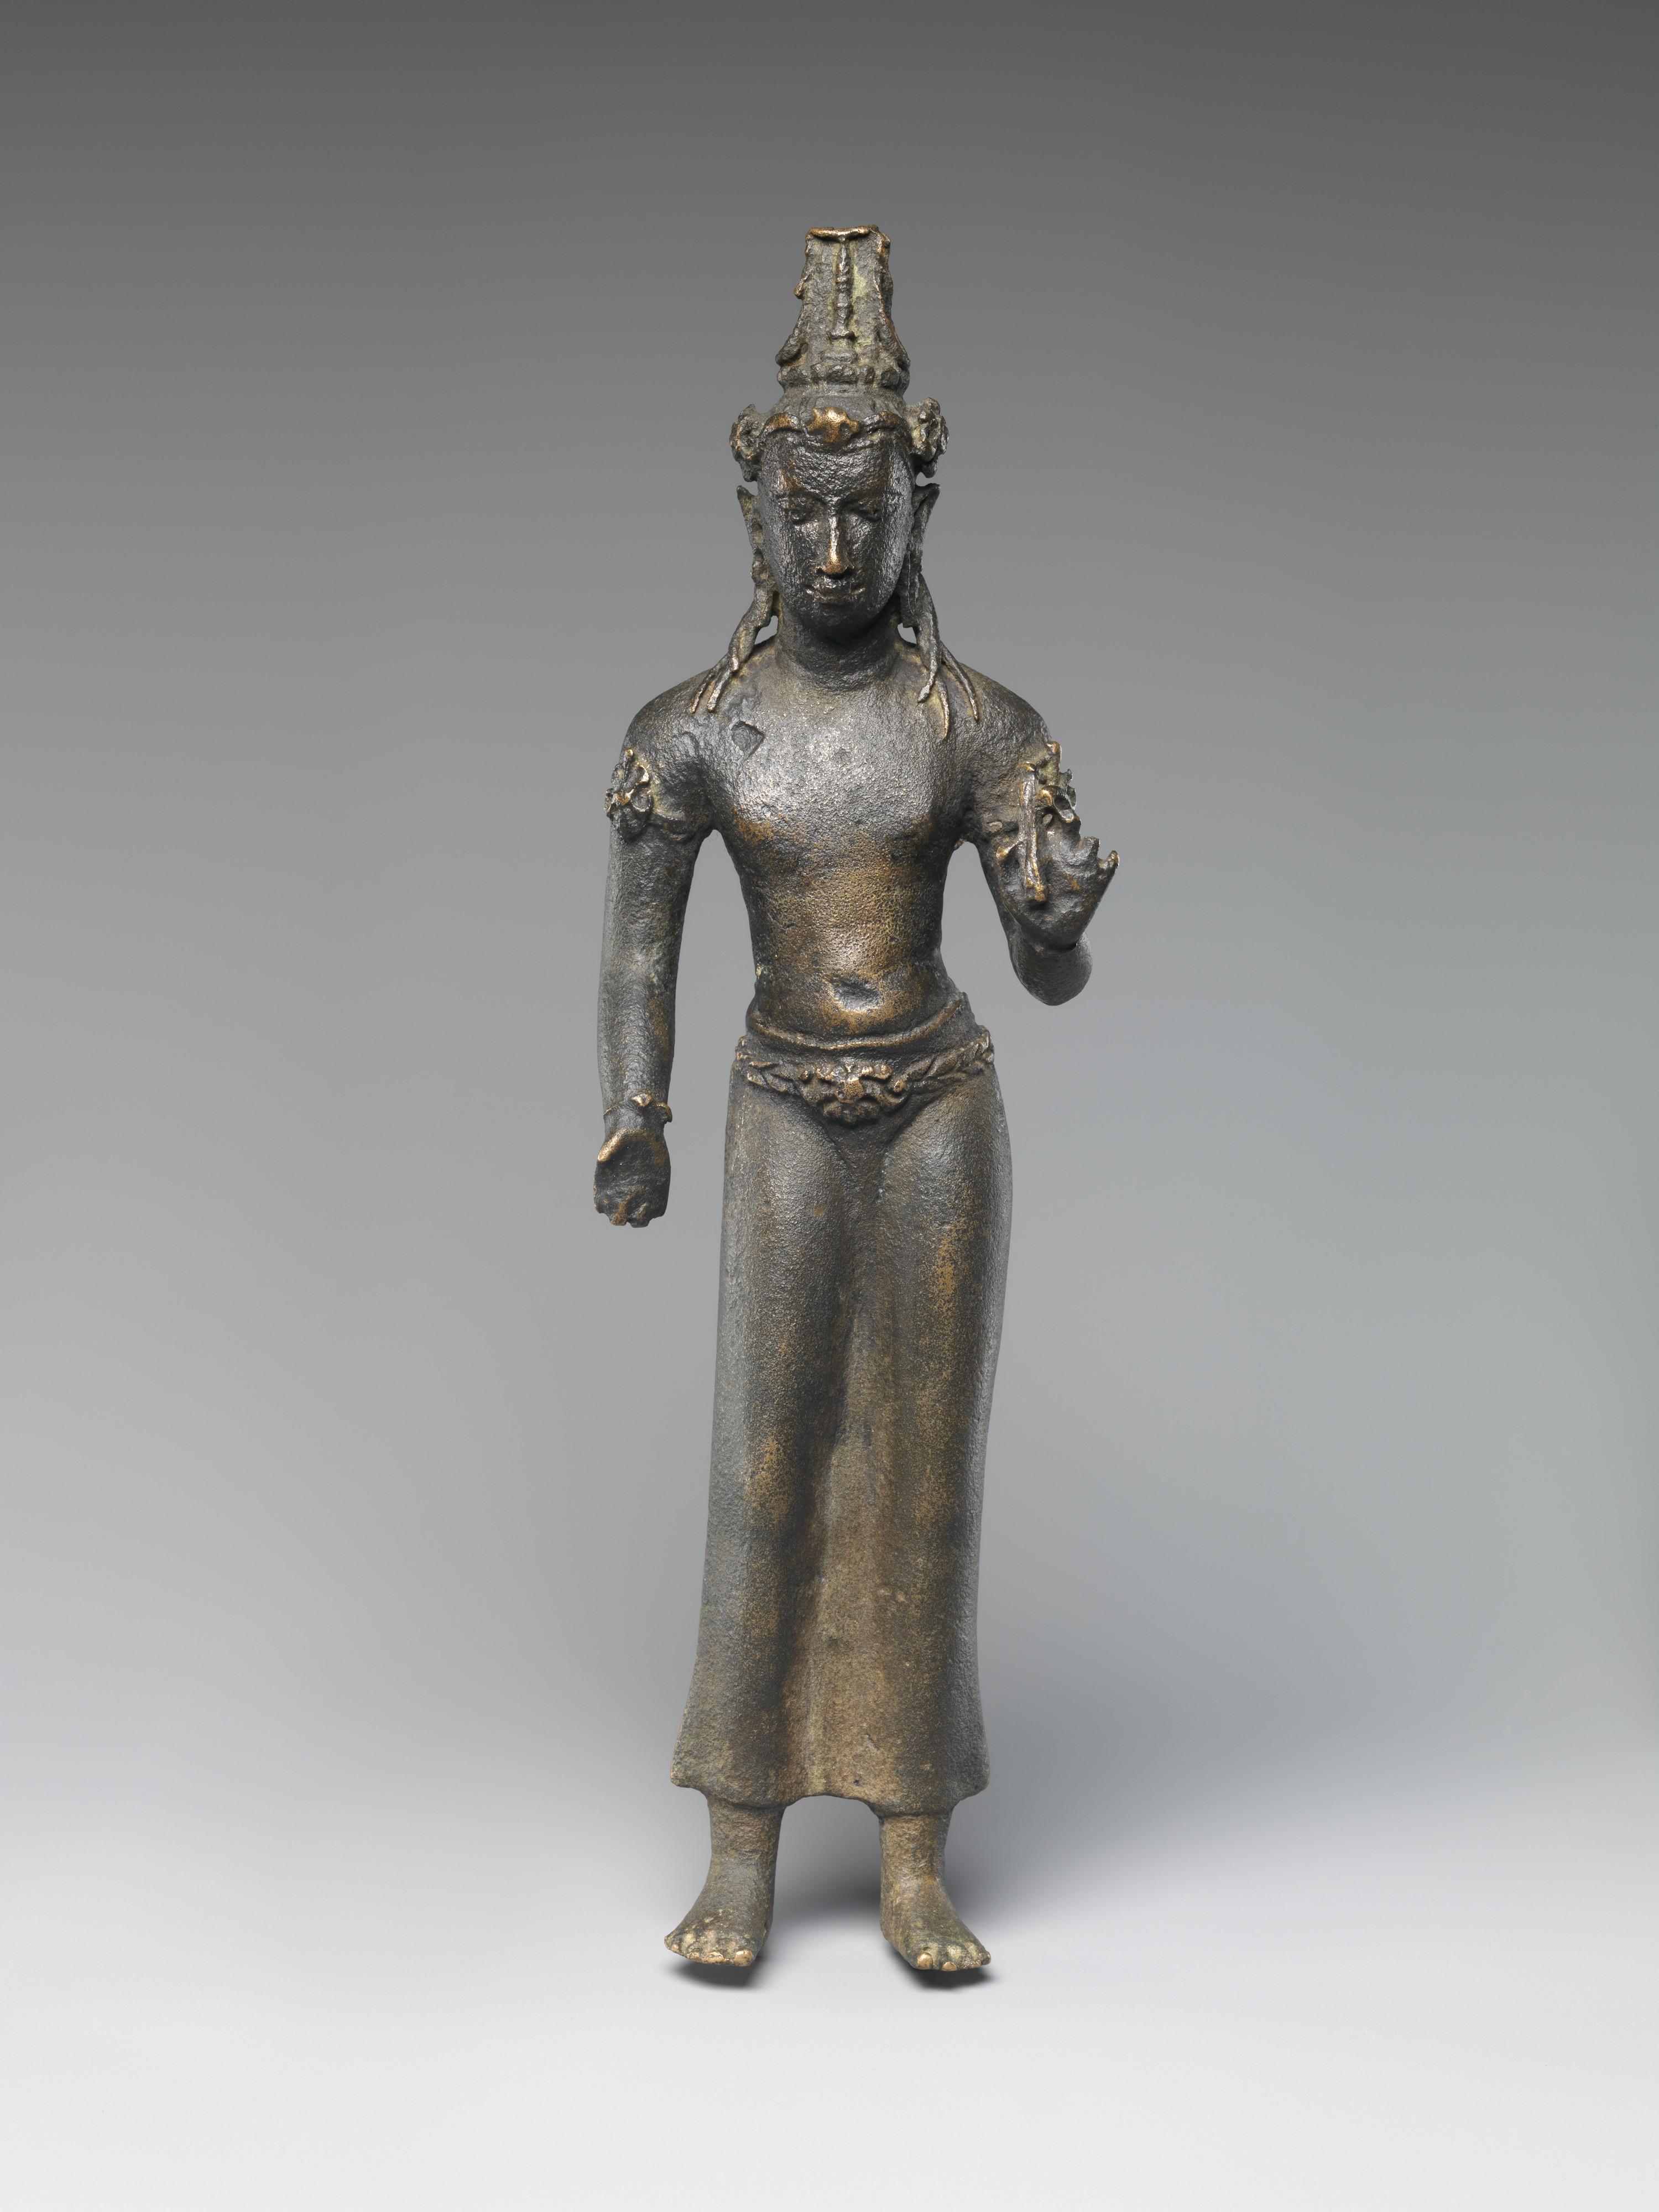 Pin by Prasit Tangjitrapitak on Ancient Indonesian art ☸️